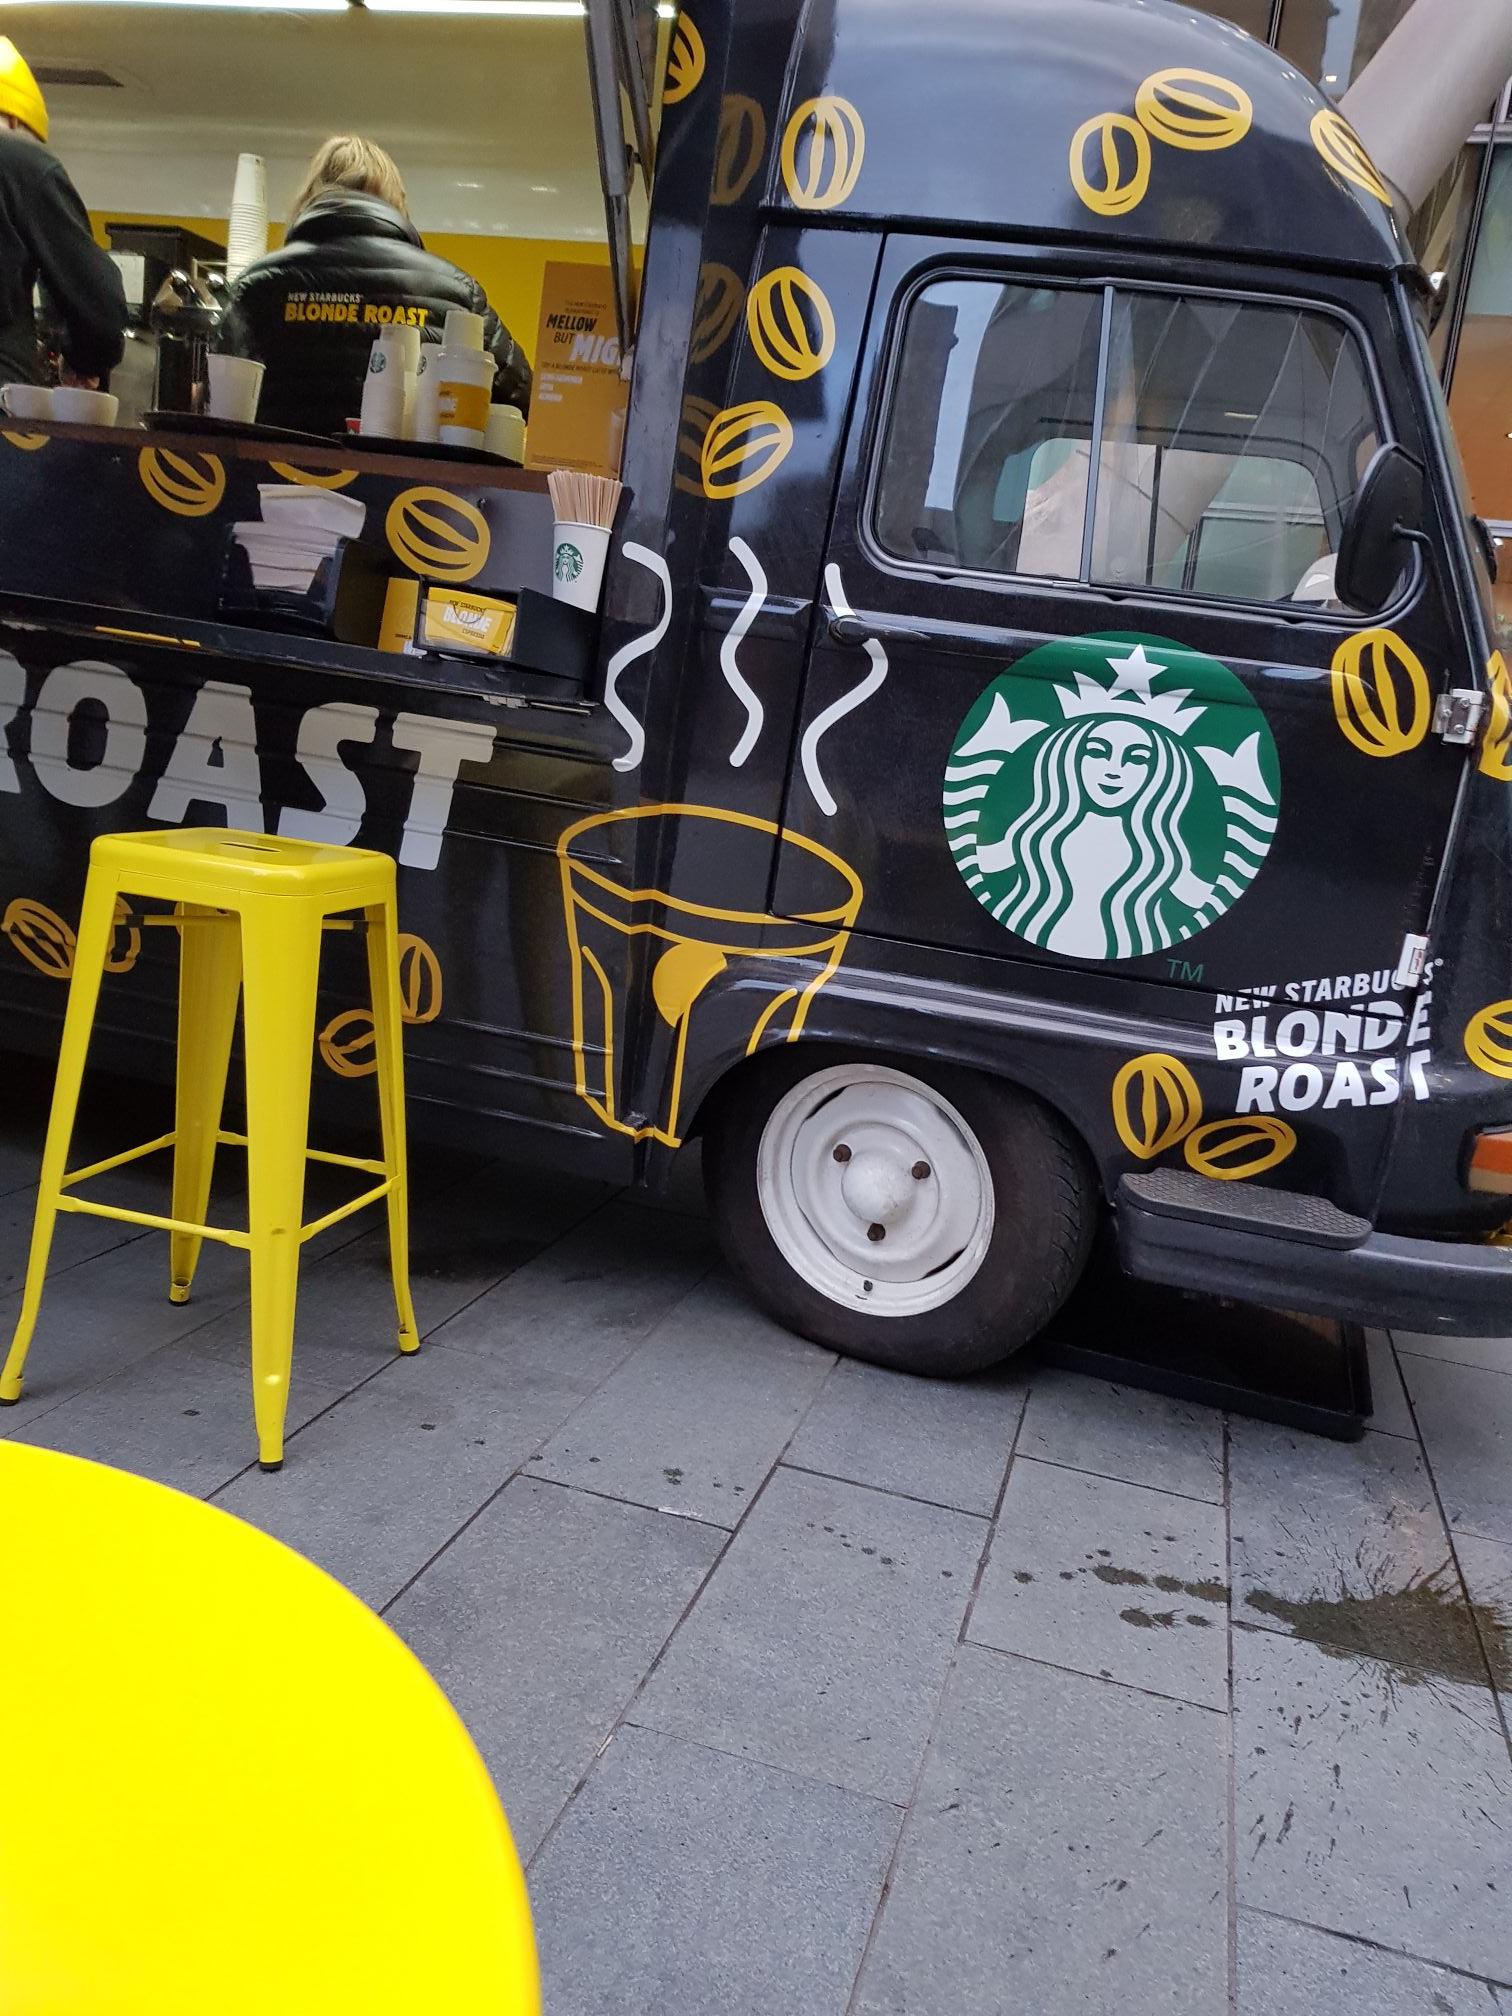 Free Starbucks blonde roast, Manchester (Spinningfields)